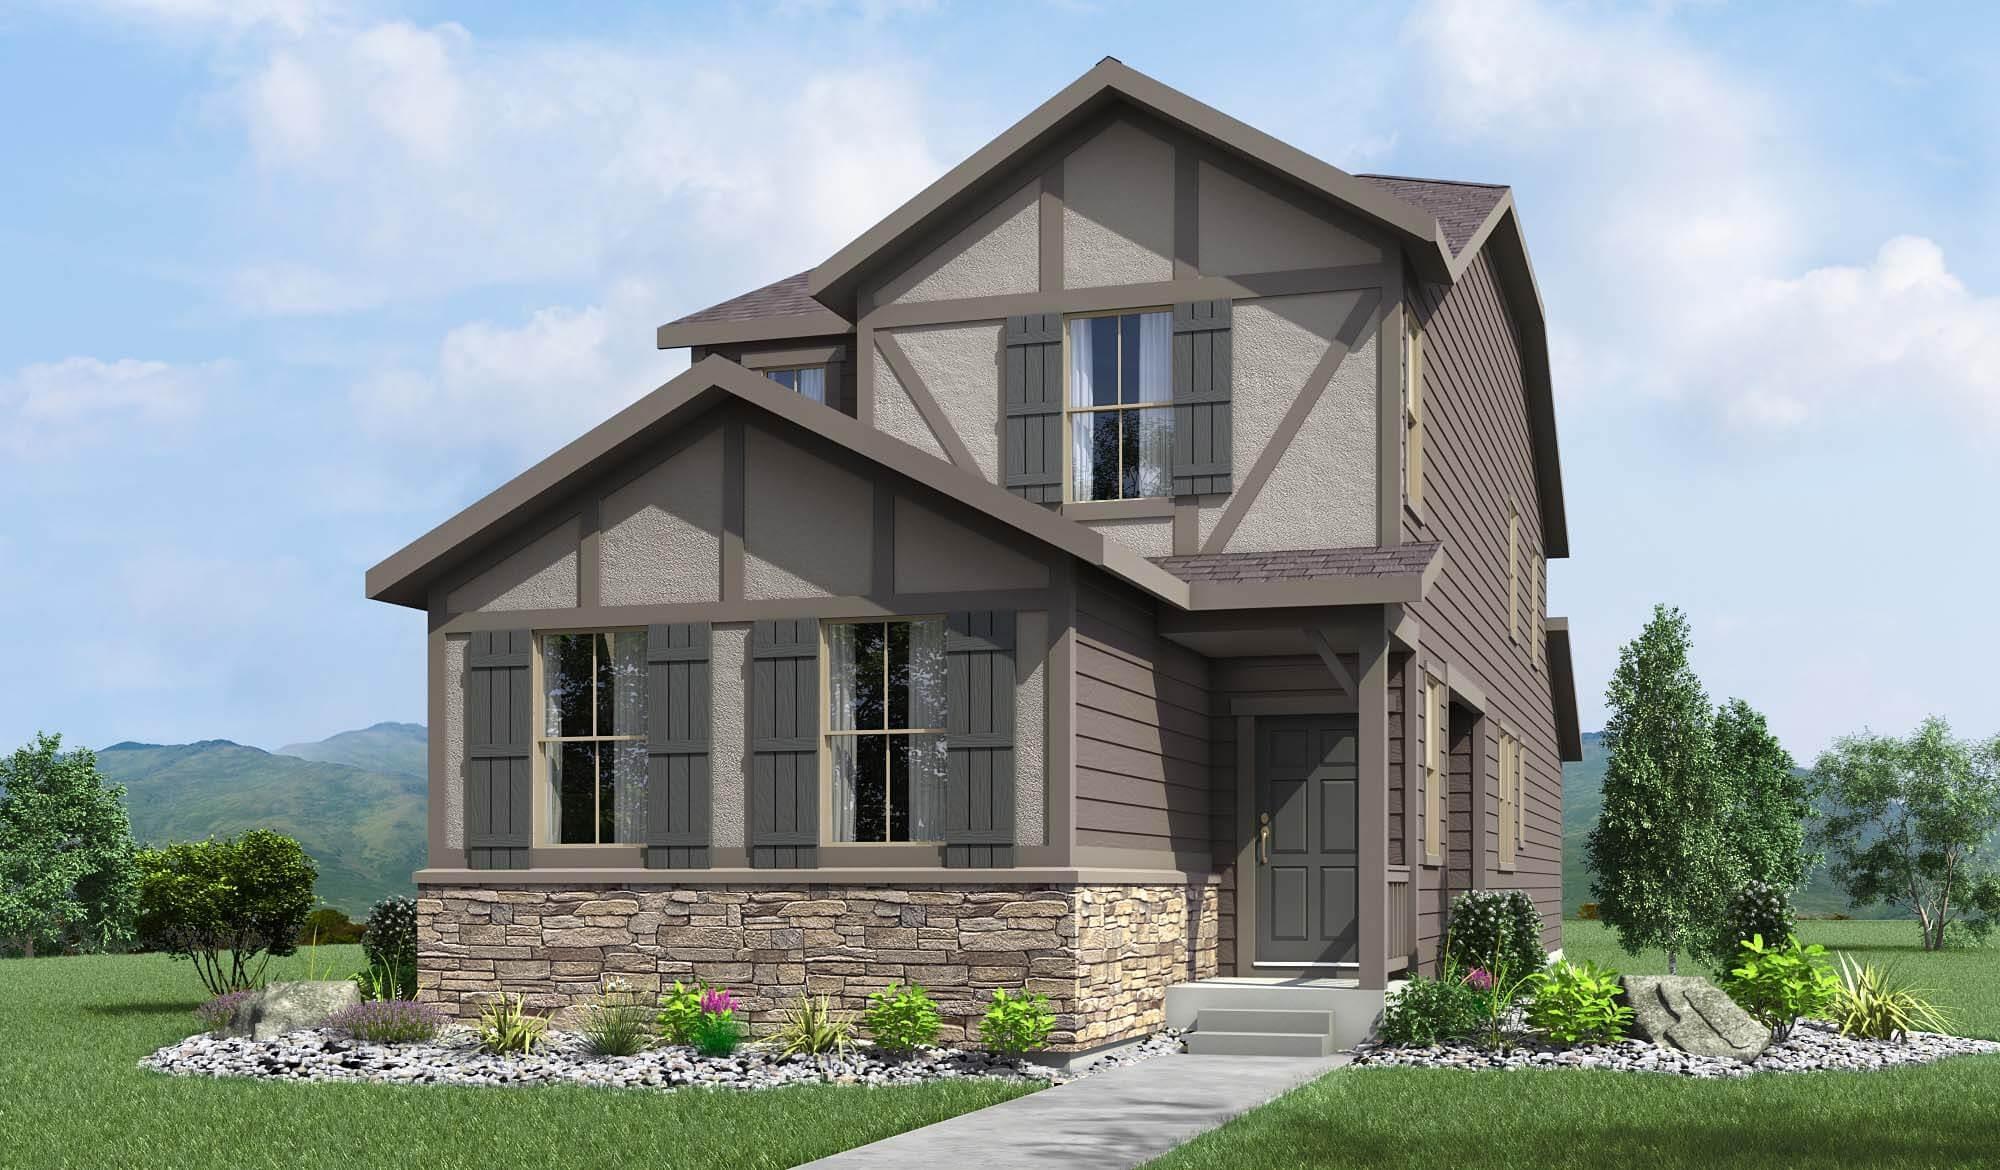 A52262_Village_Homes_Denver_Connection_22s_22C4_C_HERO20170509132633